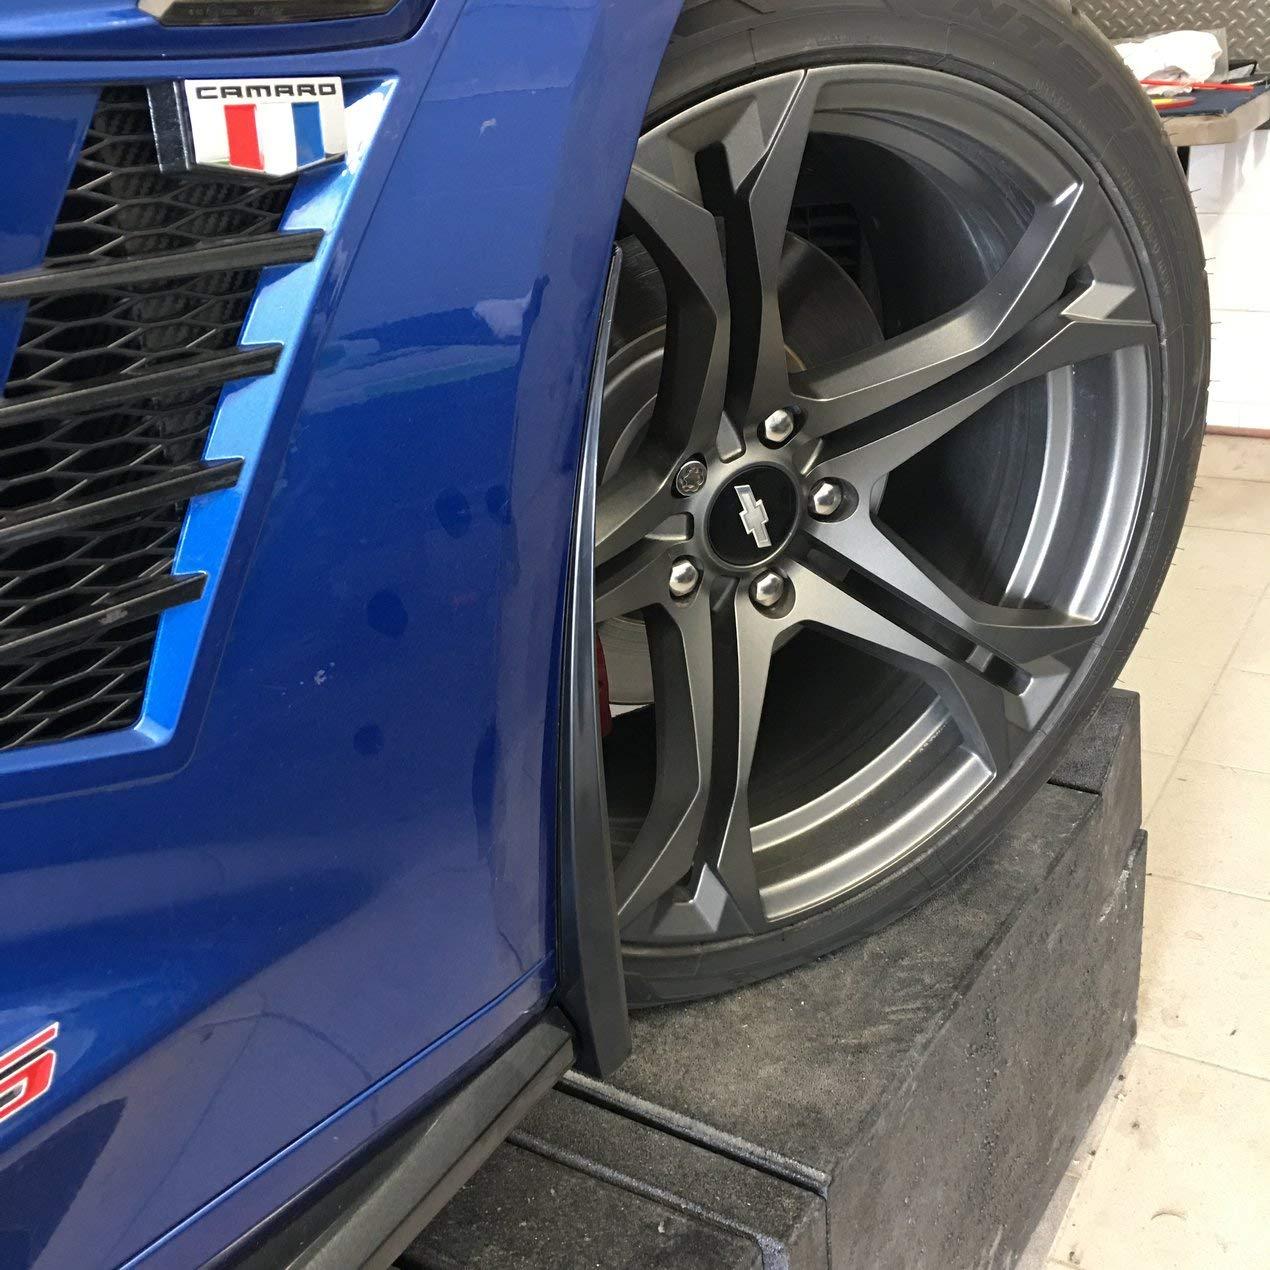 Textured Black, Front /& Rear ACS Composite Camaro Rock Chip Guards for Gen6 Camaro 2016 2017 2018 2019 Durable ABS-PC